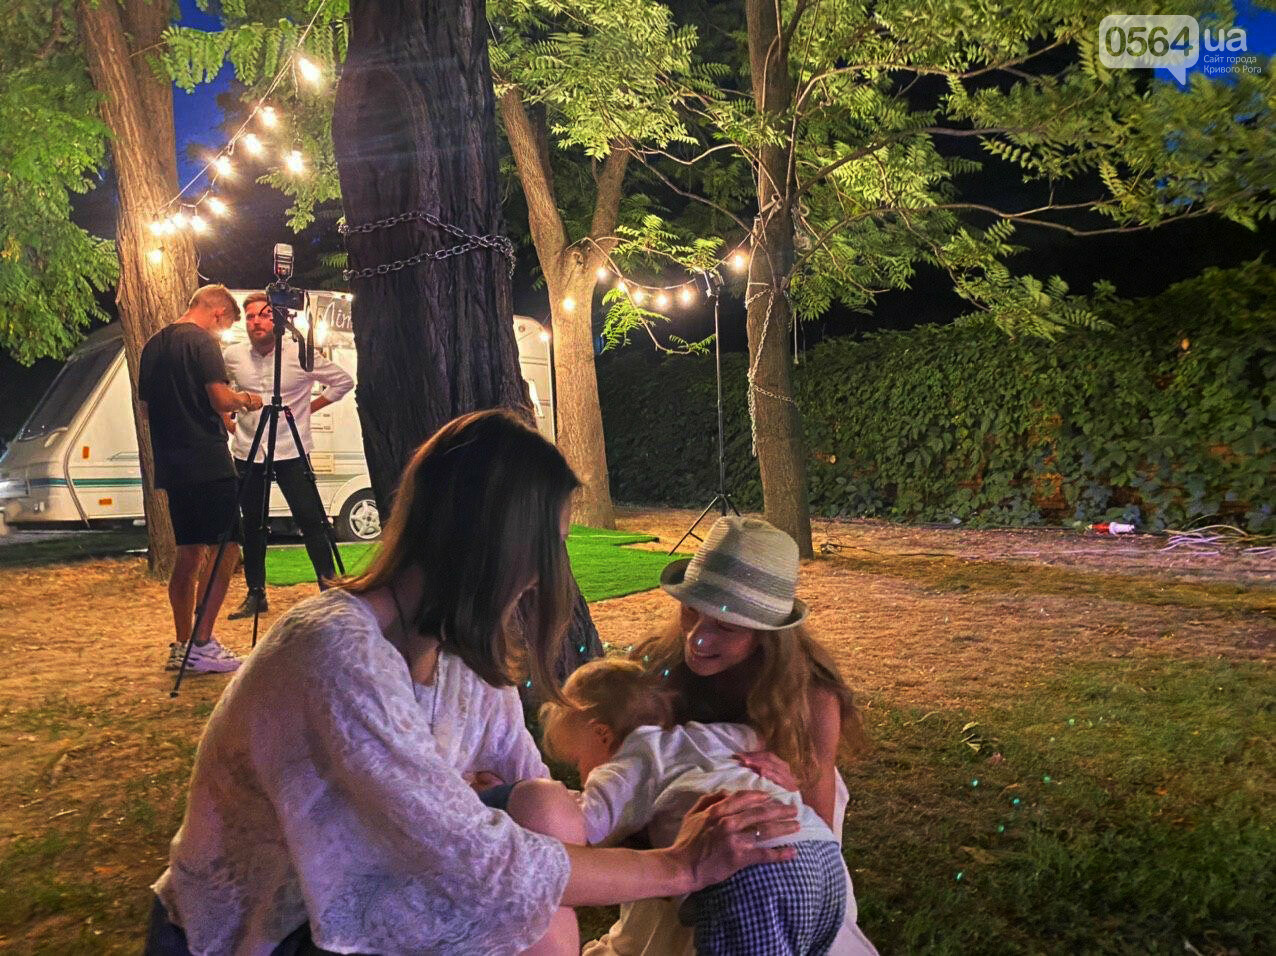 Под звездным небом криворожане наслаждались летним джазом от  Advantage Project, - ФОТО, ВИДЕО , фото-60